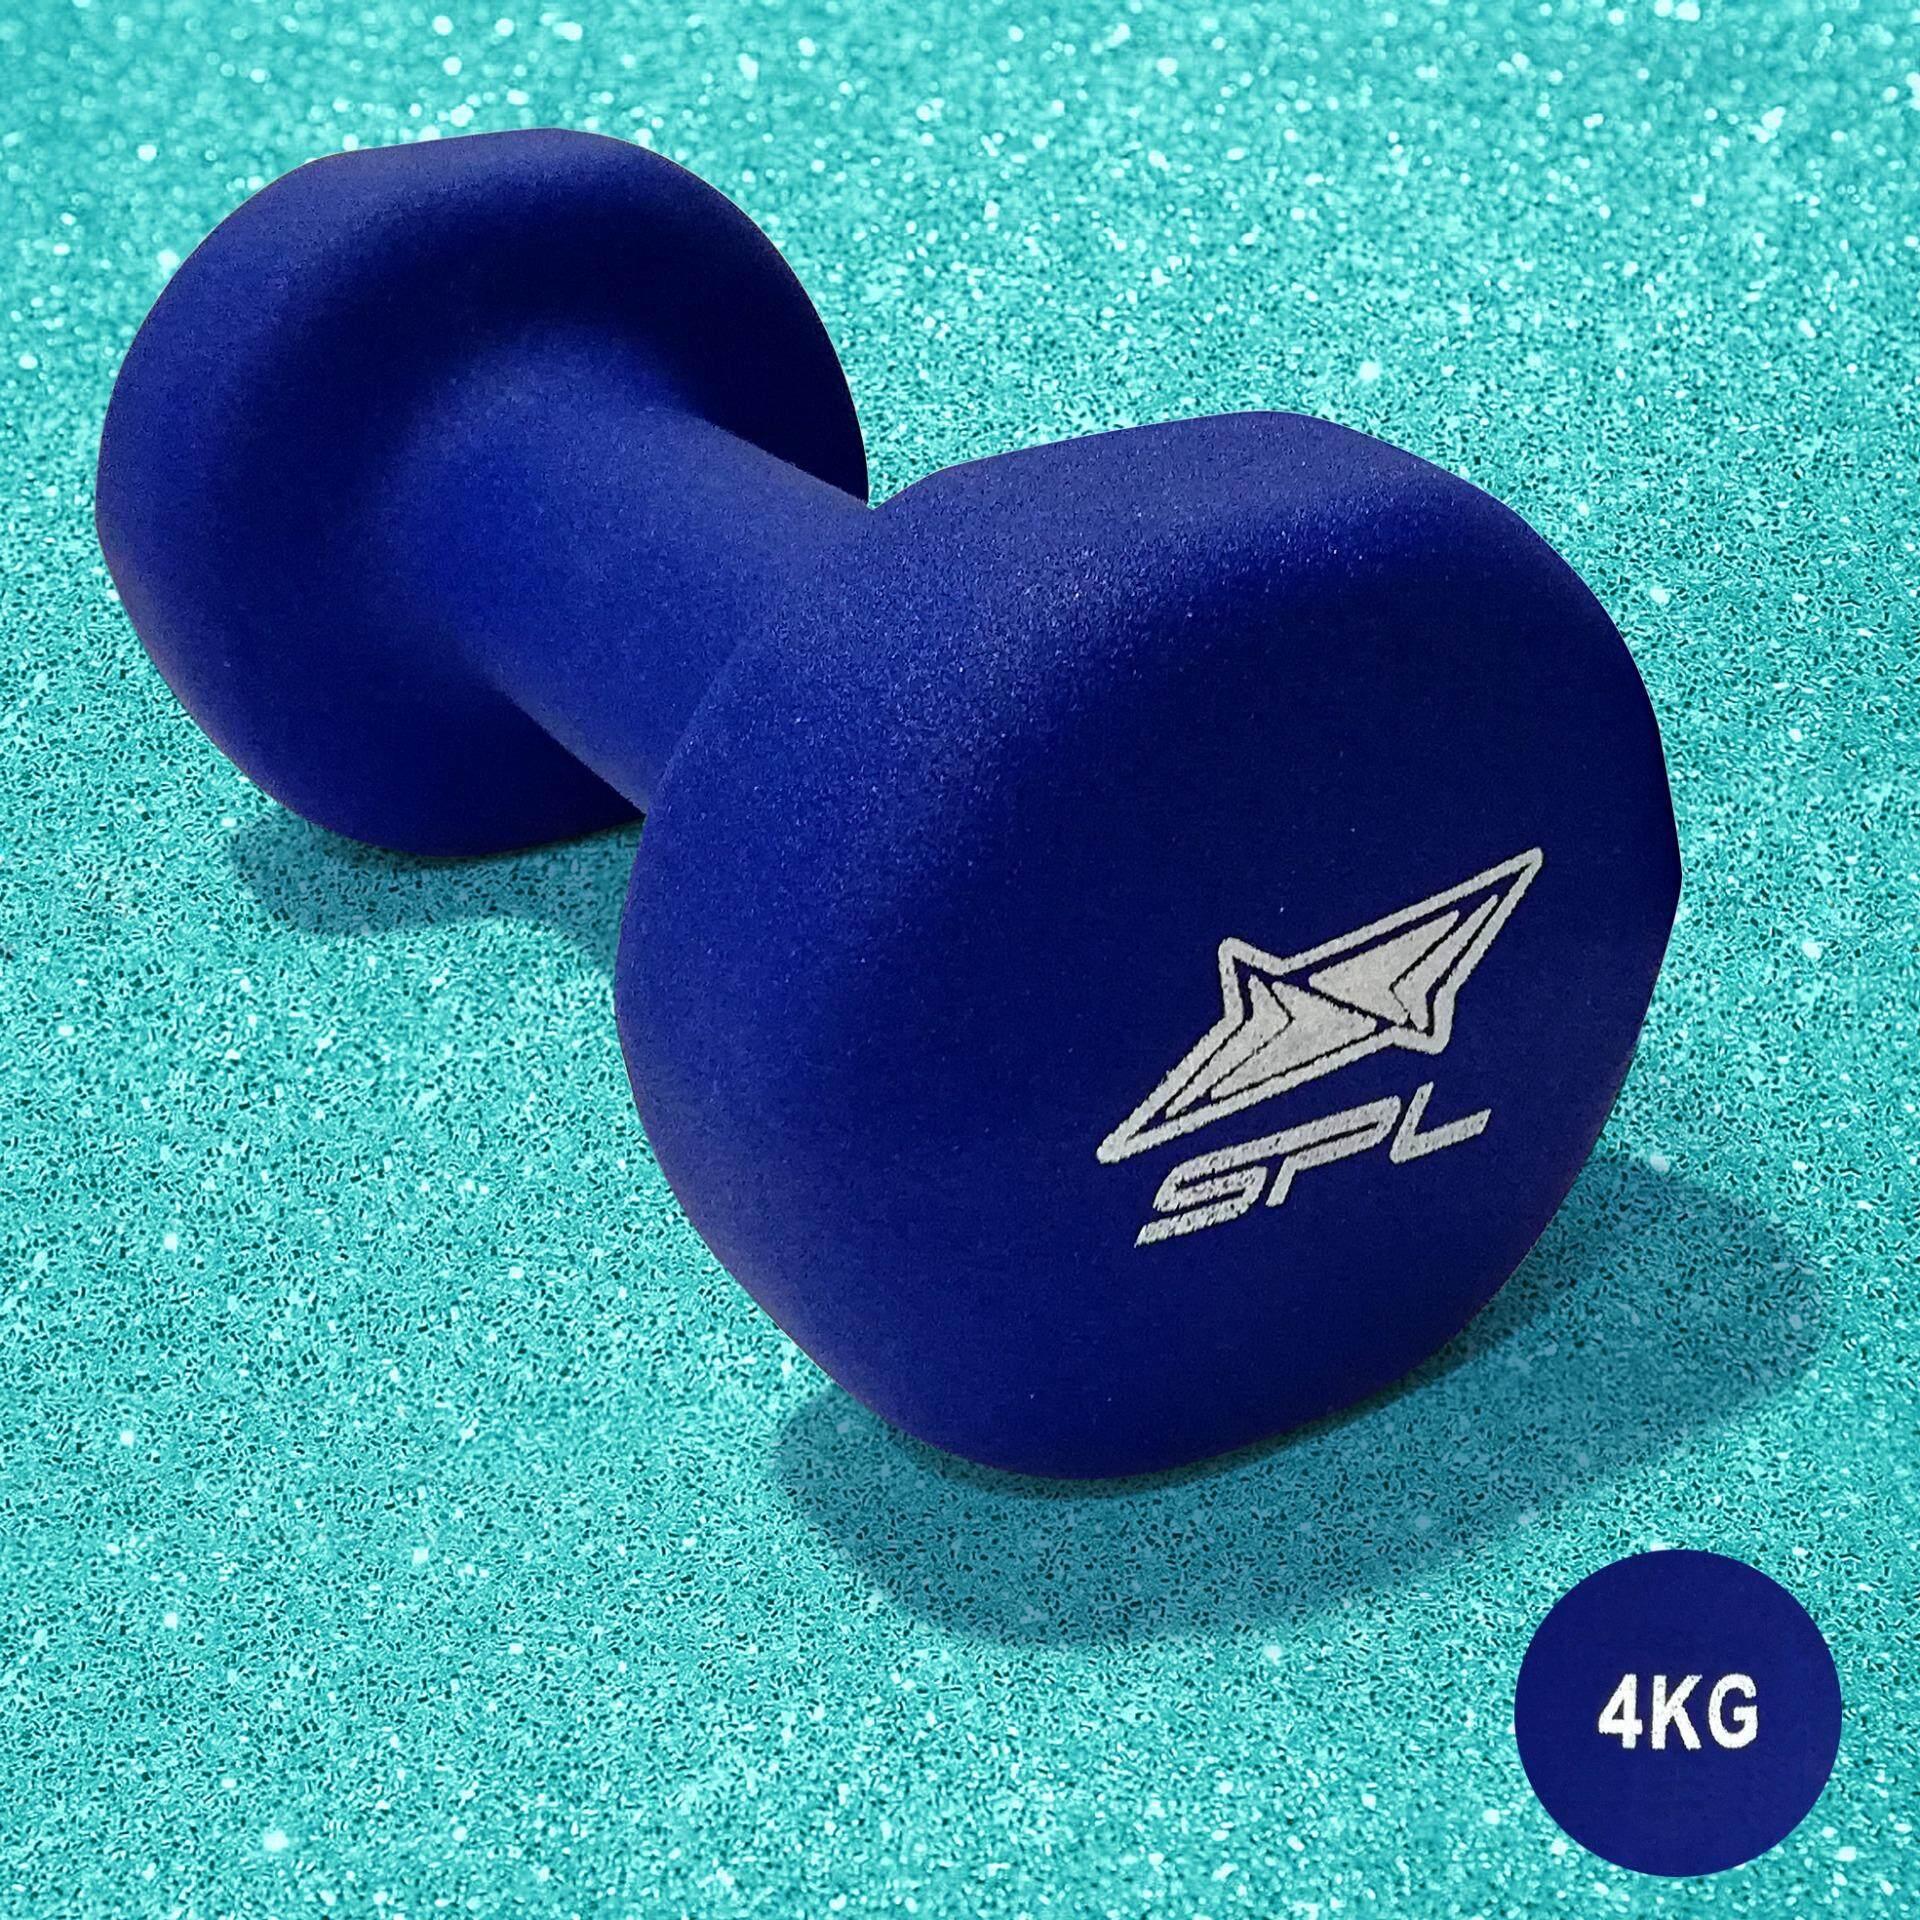 SPORTLAND ดัมเบล Neoprene Dumbbell Rubber 4 kg. รุ่น IR92004 (Blue)